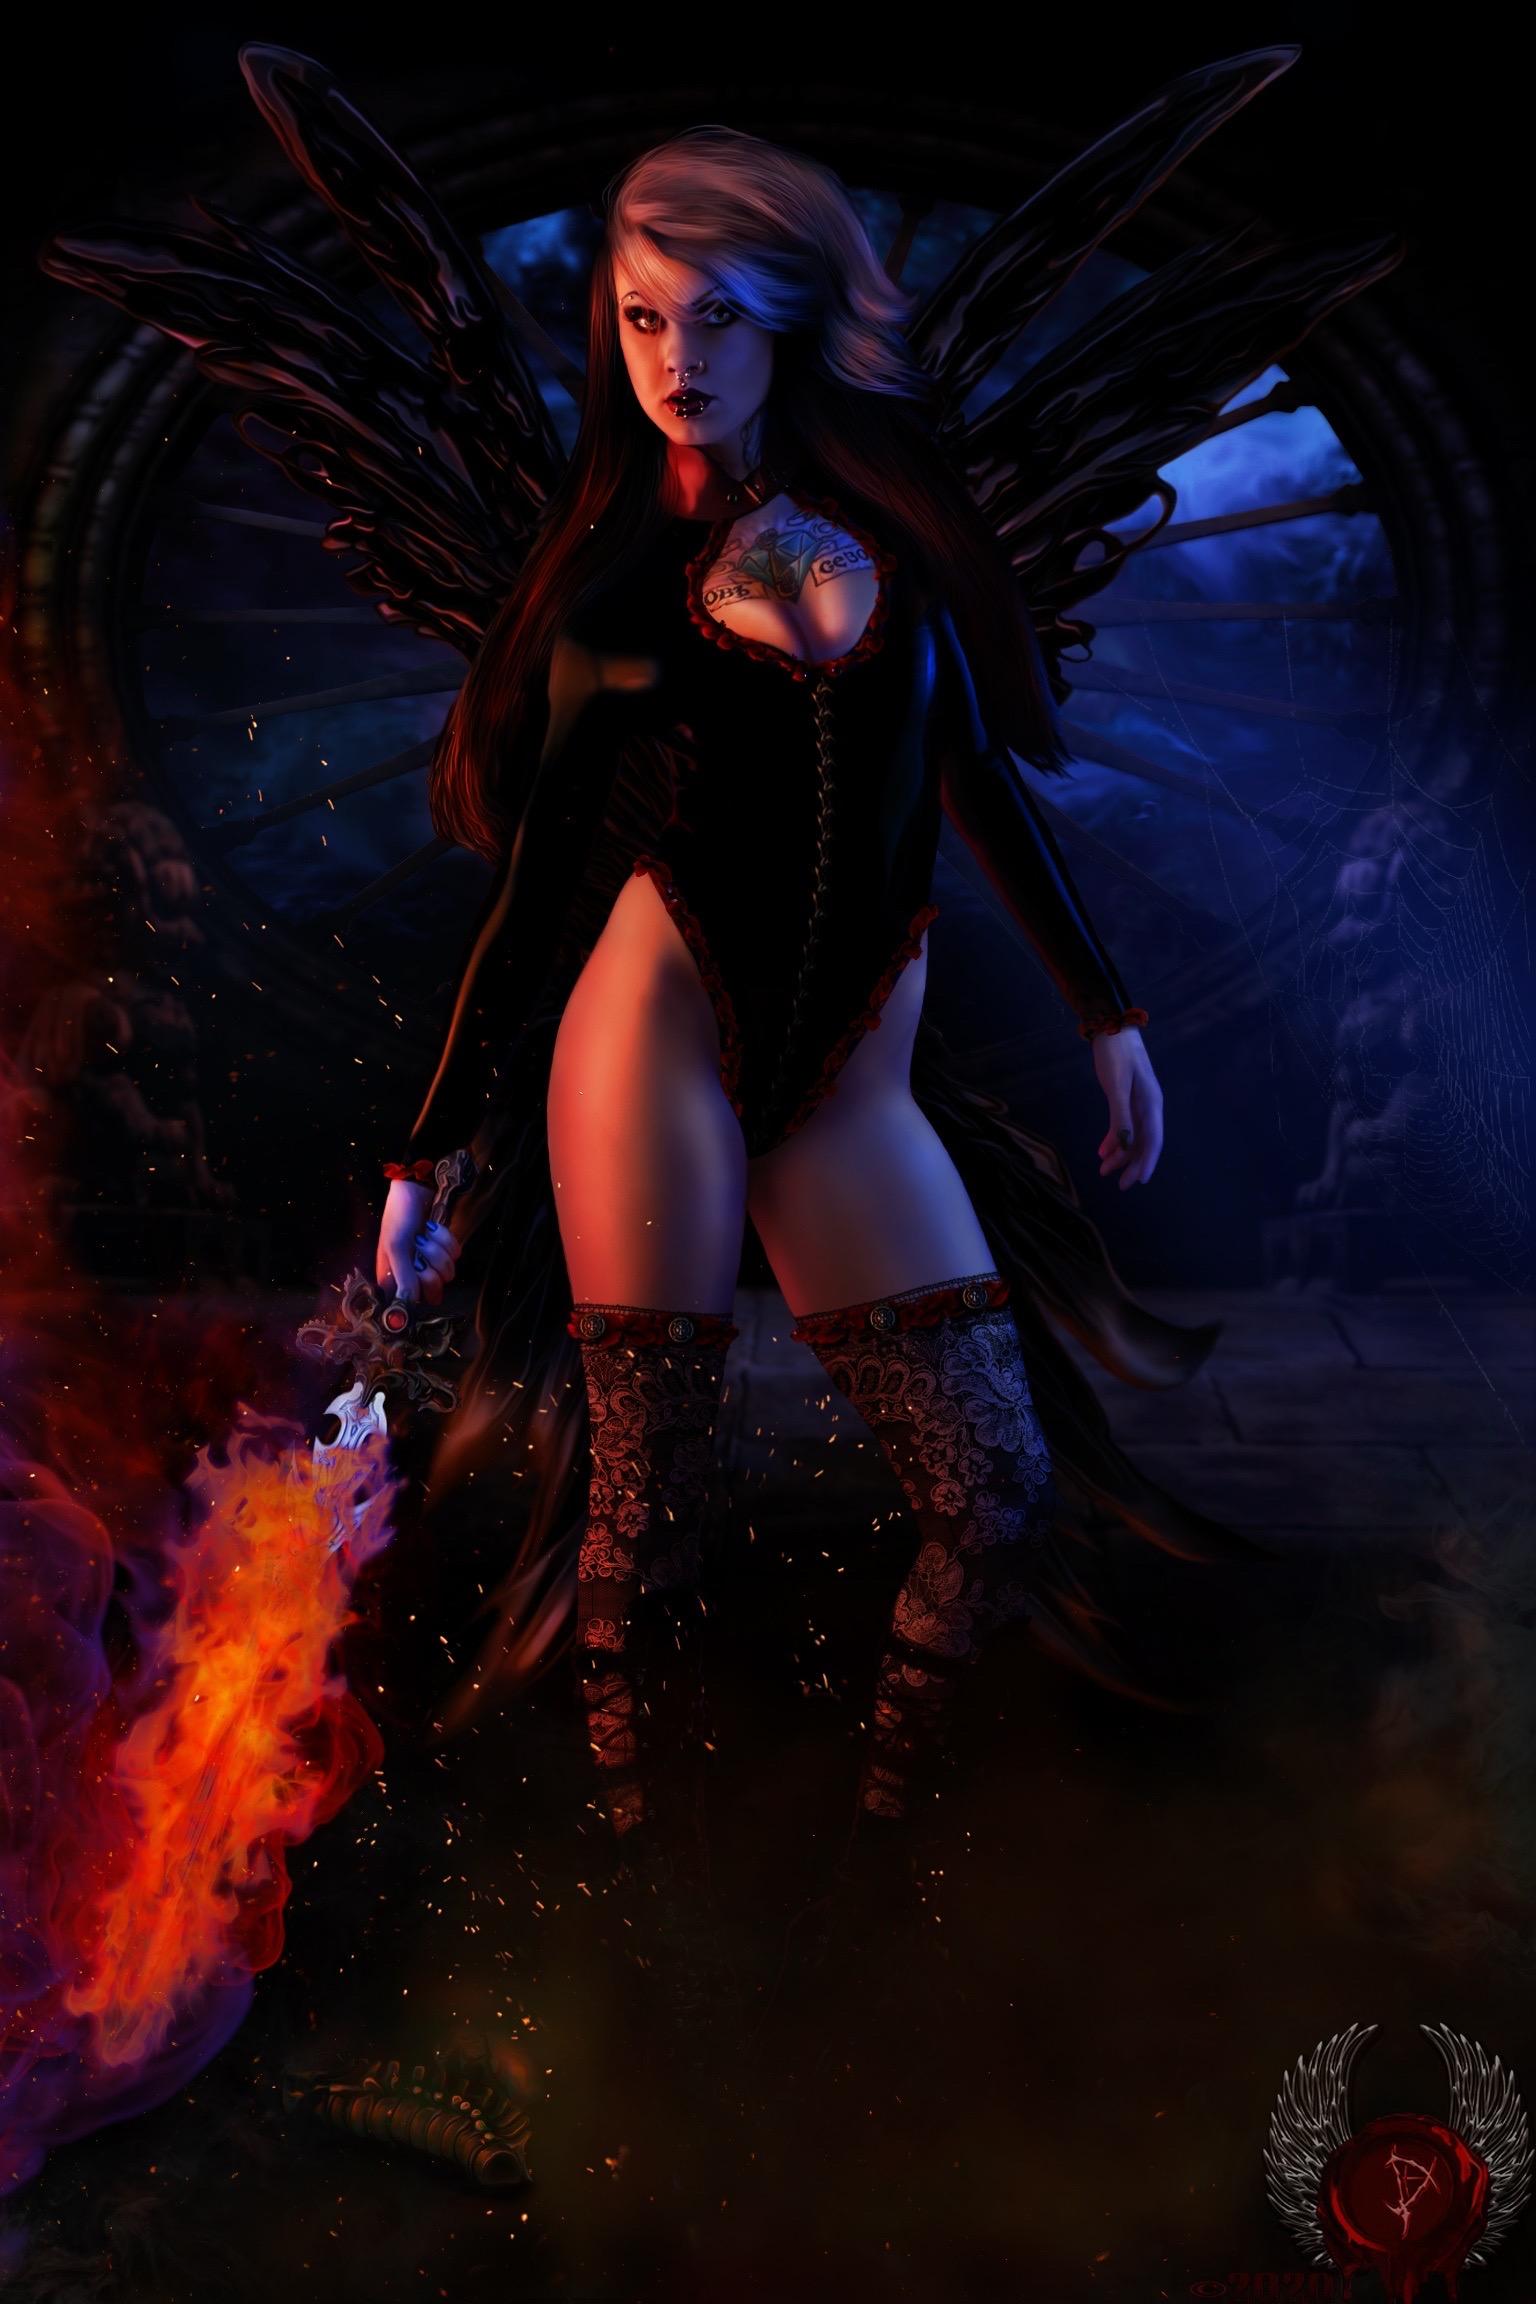 Fire Fairy 2